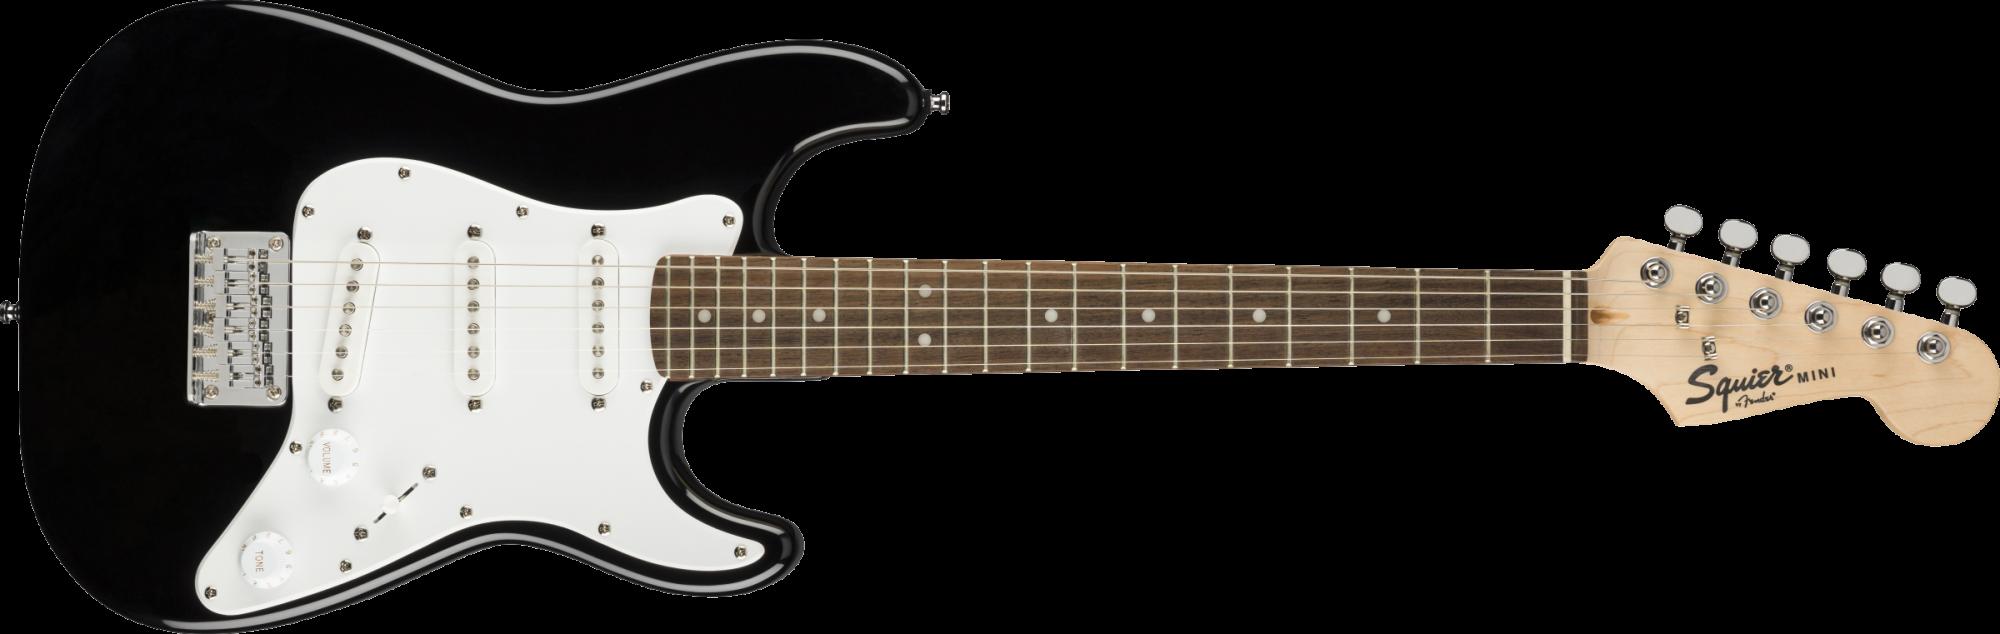 Fender/Squier Mini Stratocaster, Laurel Fingerboard, Black